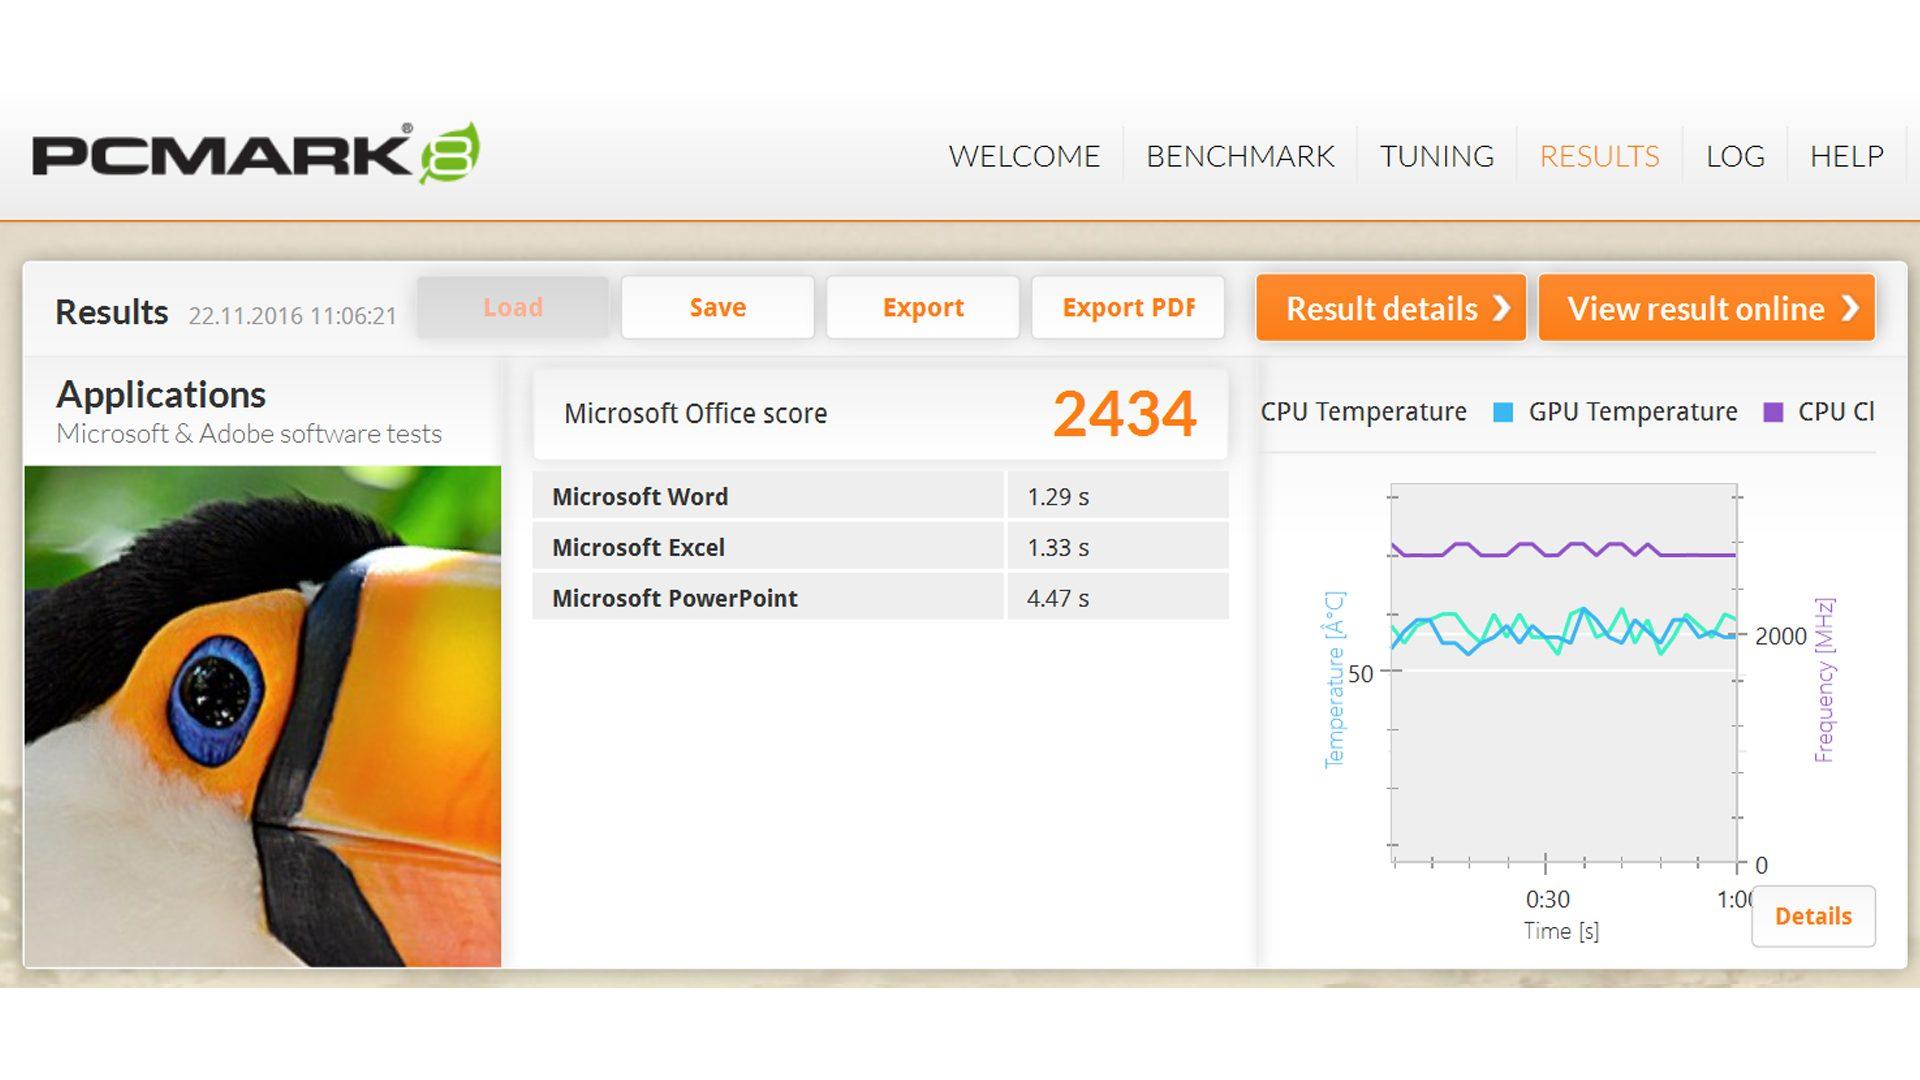 asus-zenbook-ux310ua-fc114t-benchmark-4